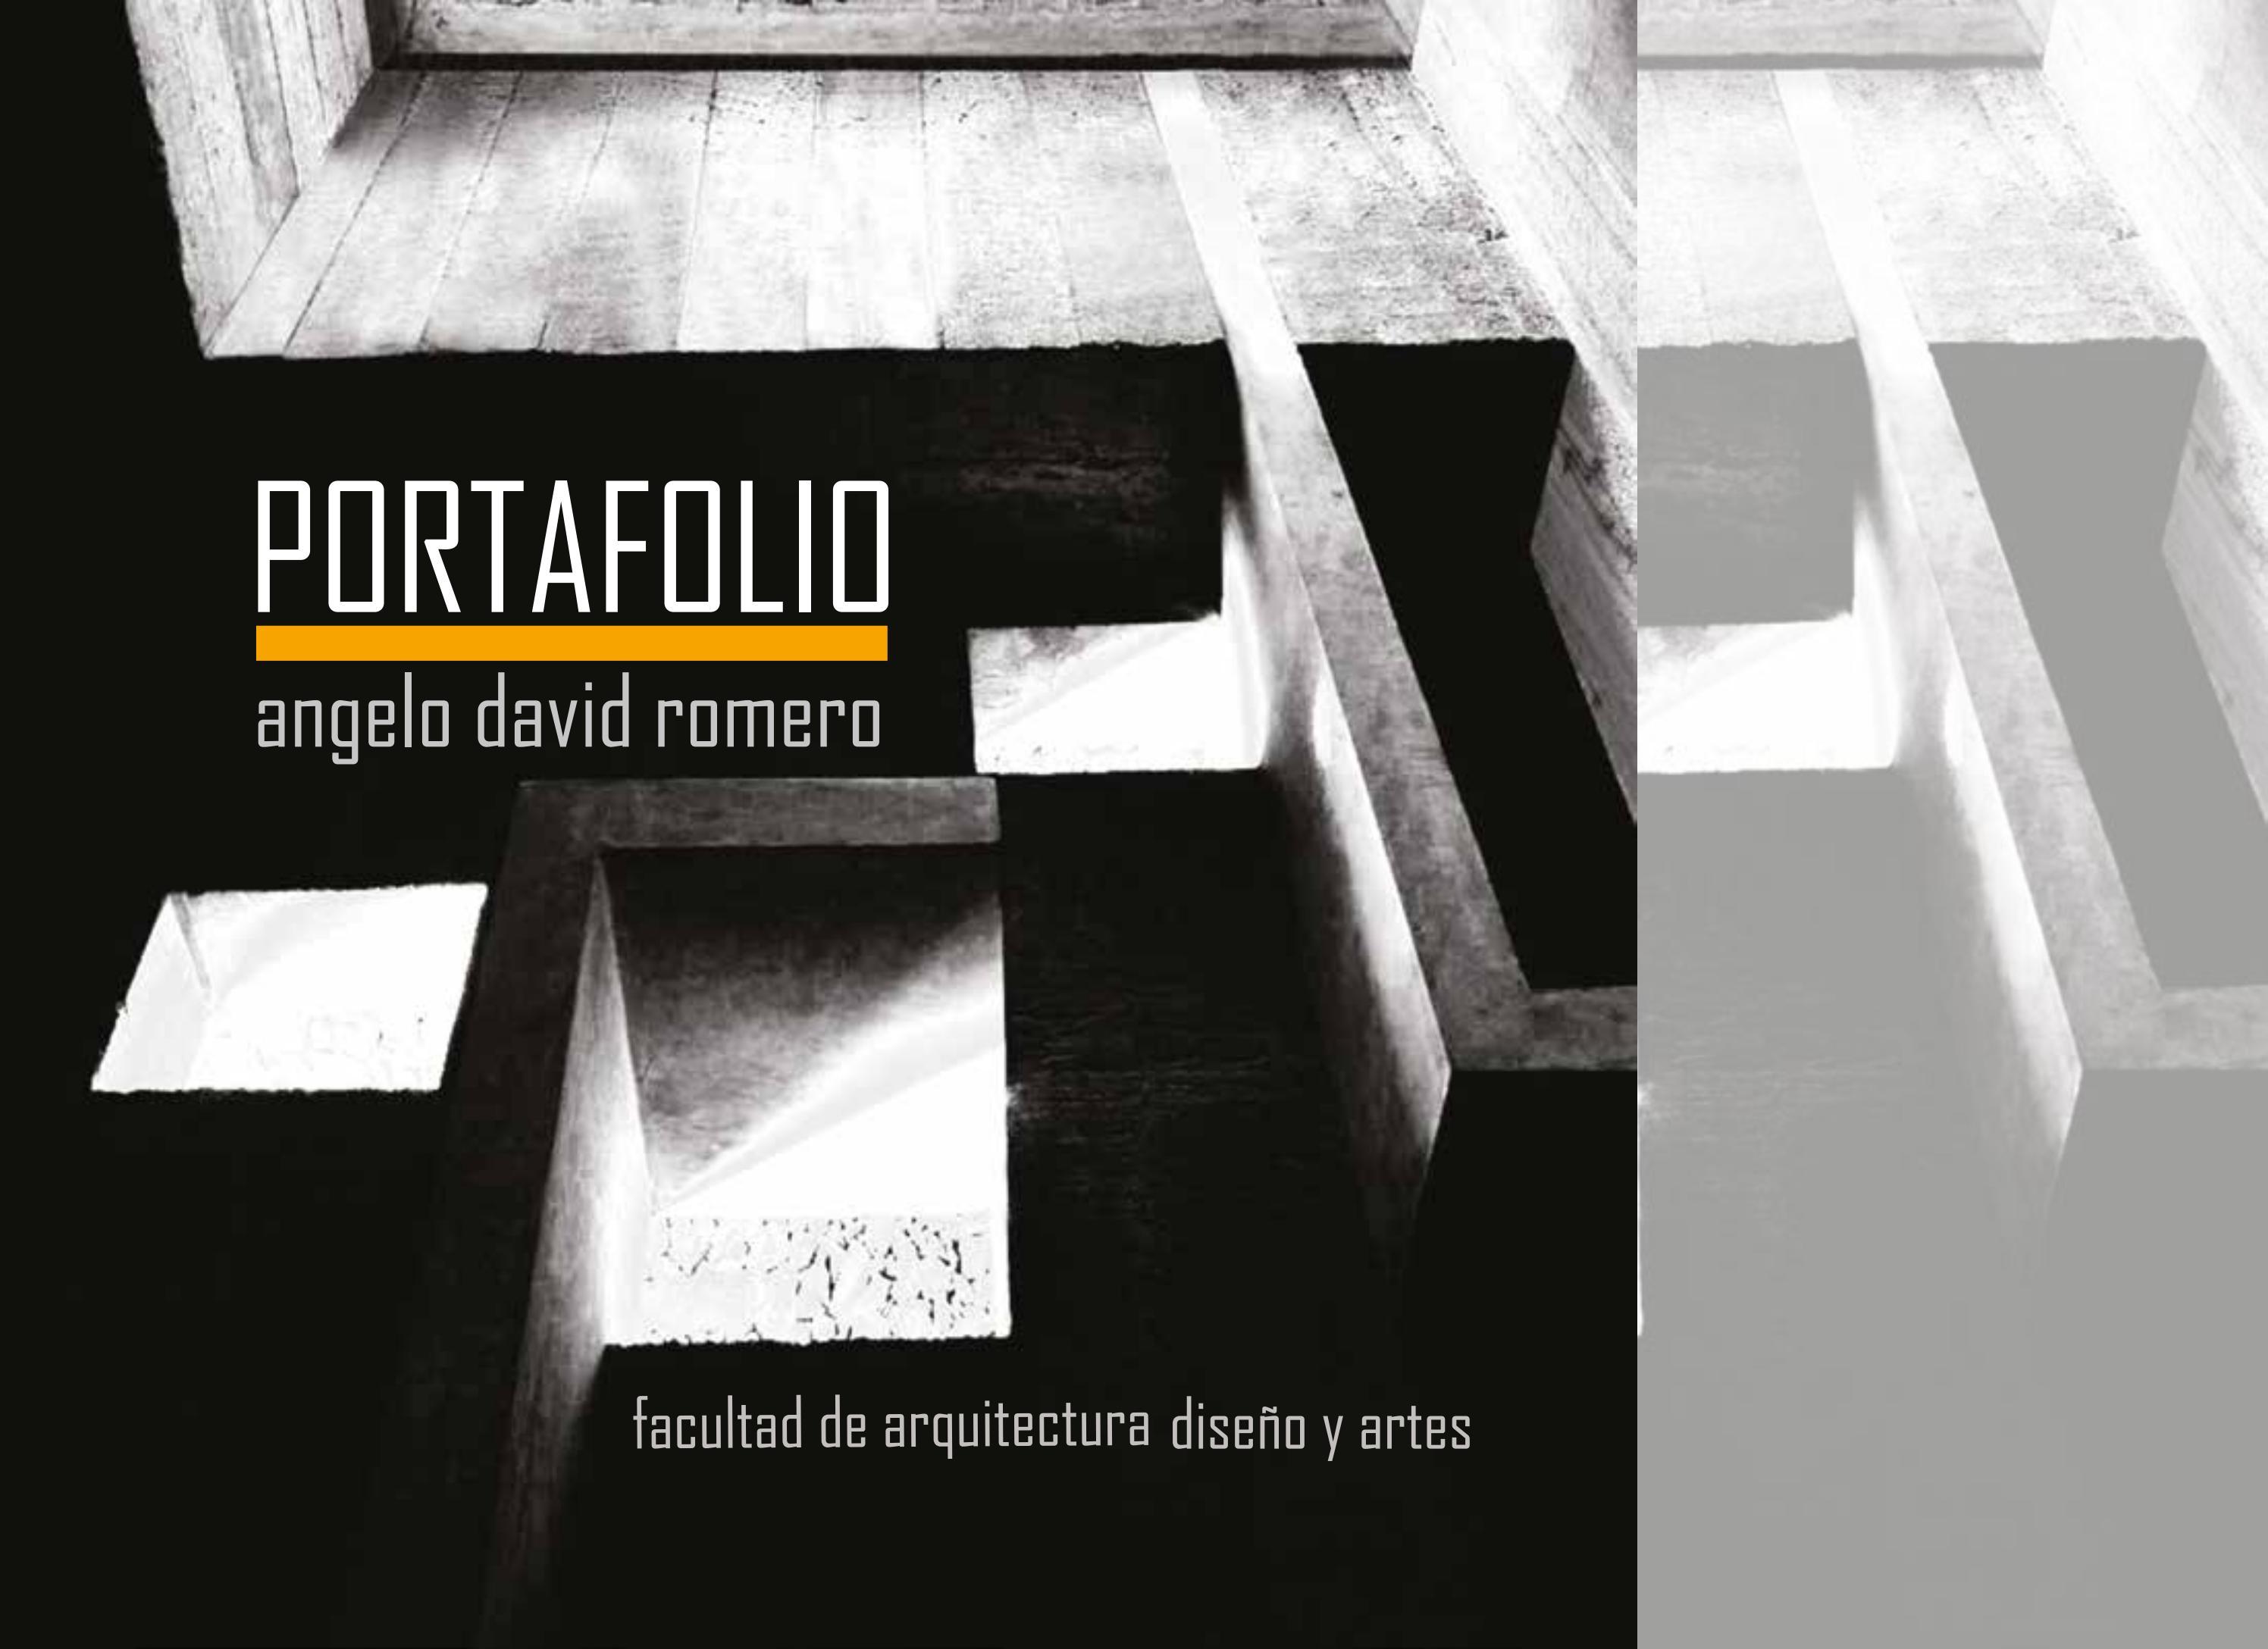 Portafolio arquitectura by angelo david issuu for Portafolio arquitectura